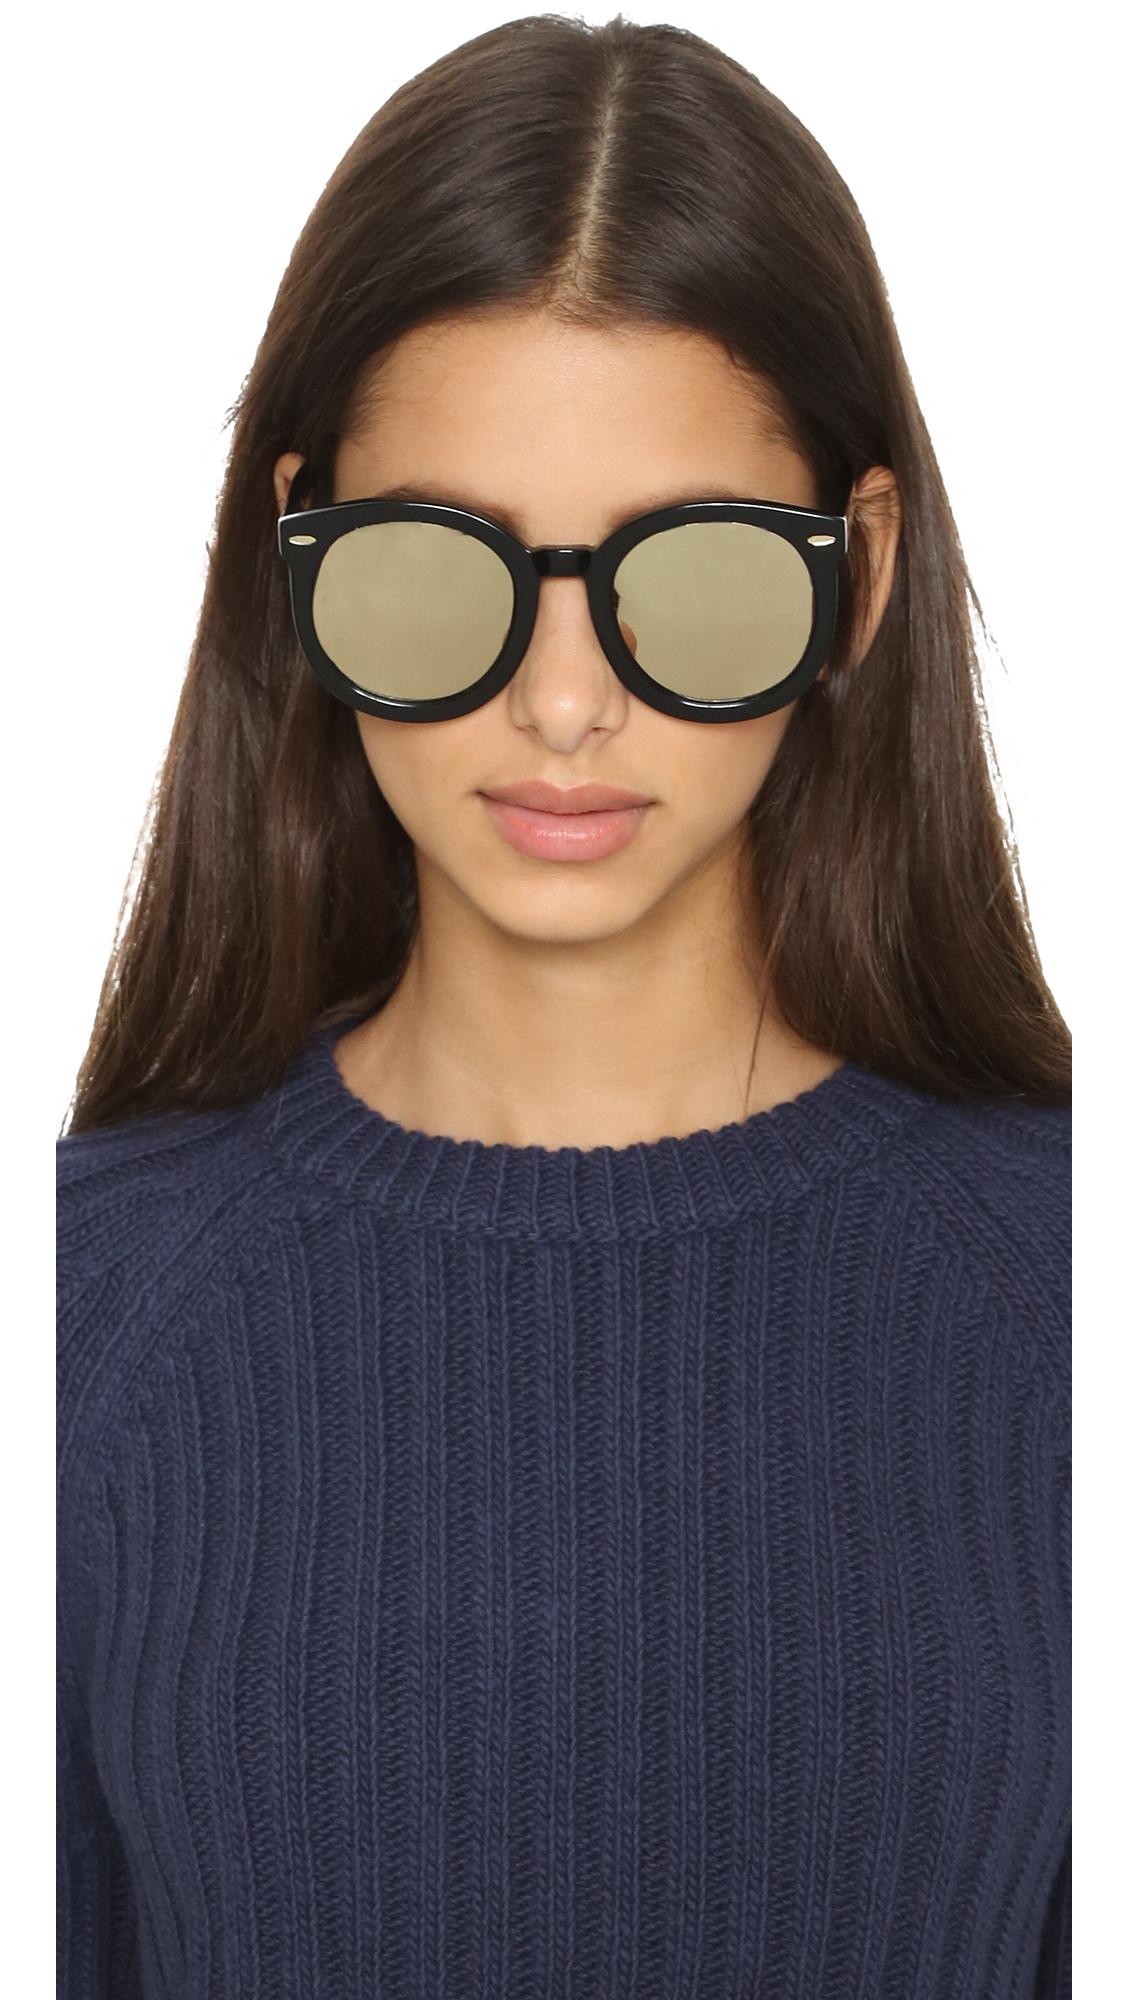 2bc310b1513 Lyst - Karen Walker Superstars Super Duper Strength Sunglasses ...